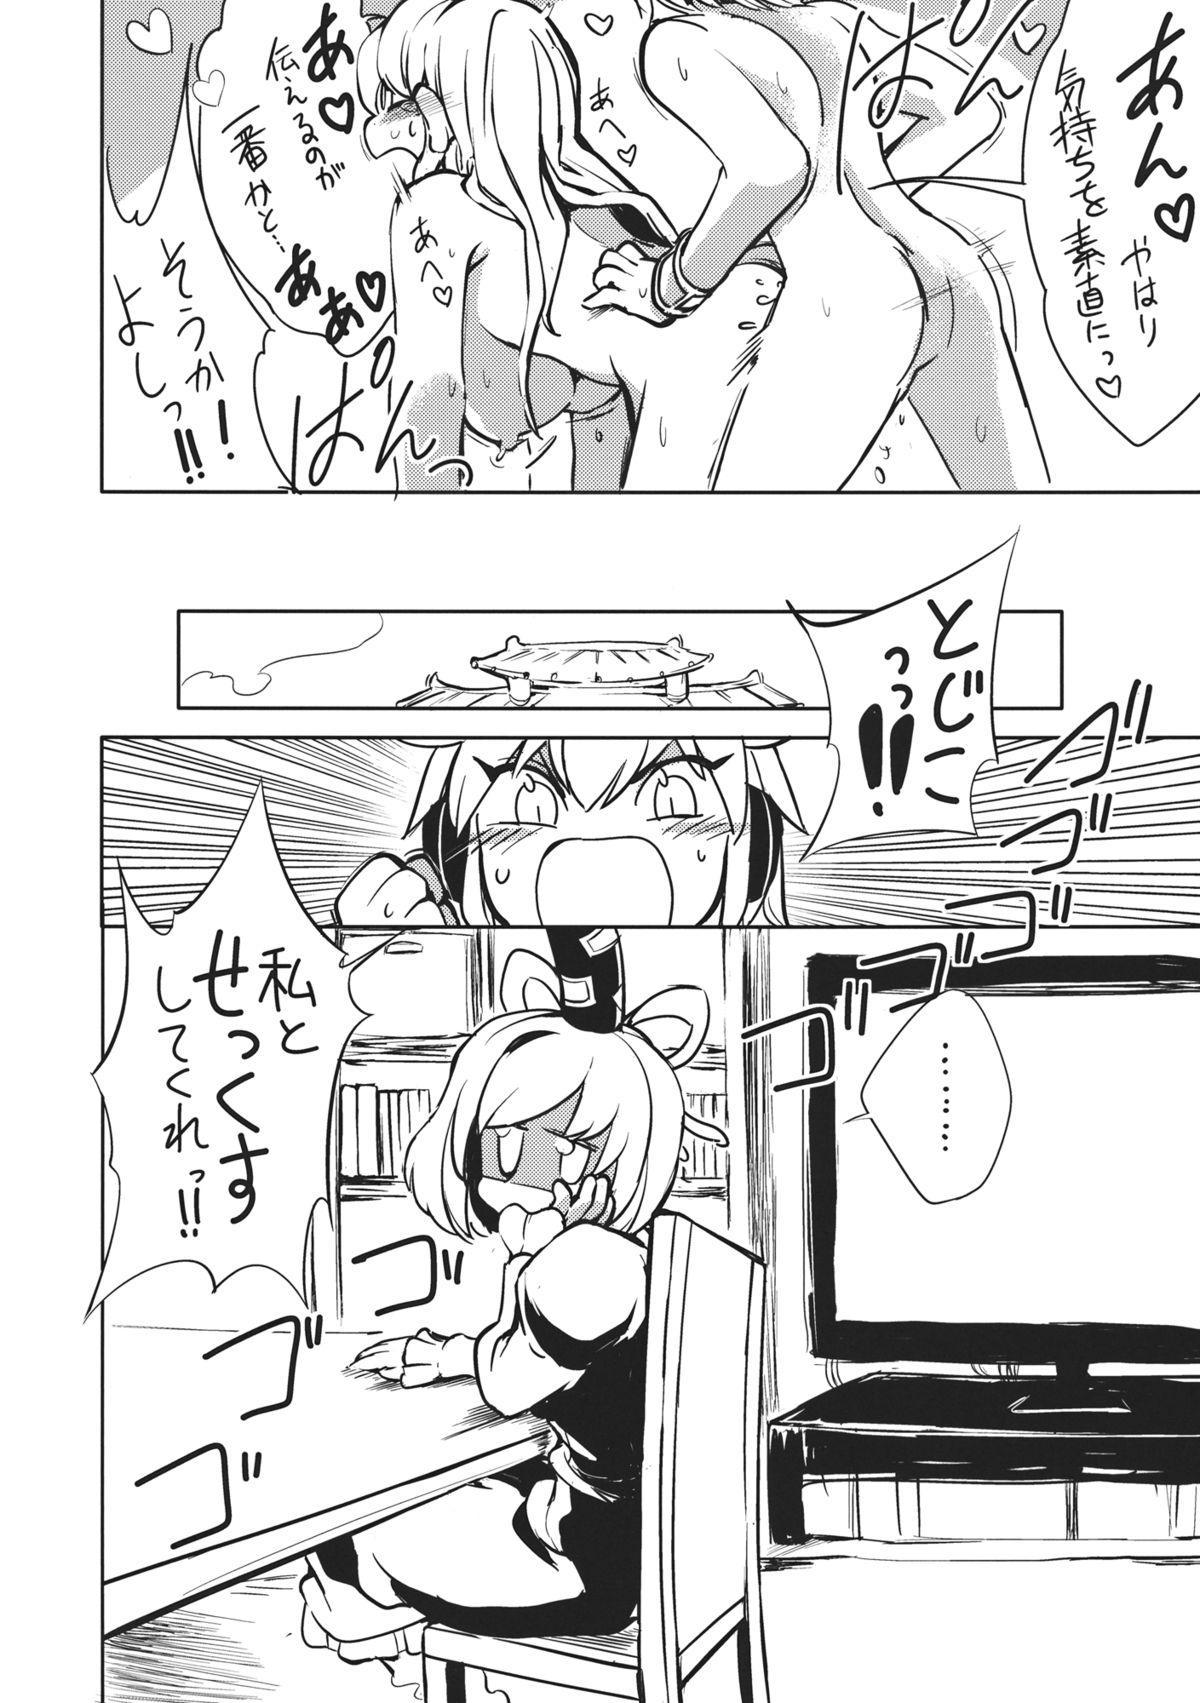 Tojiko to Sex 4